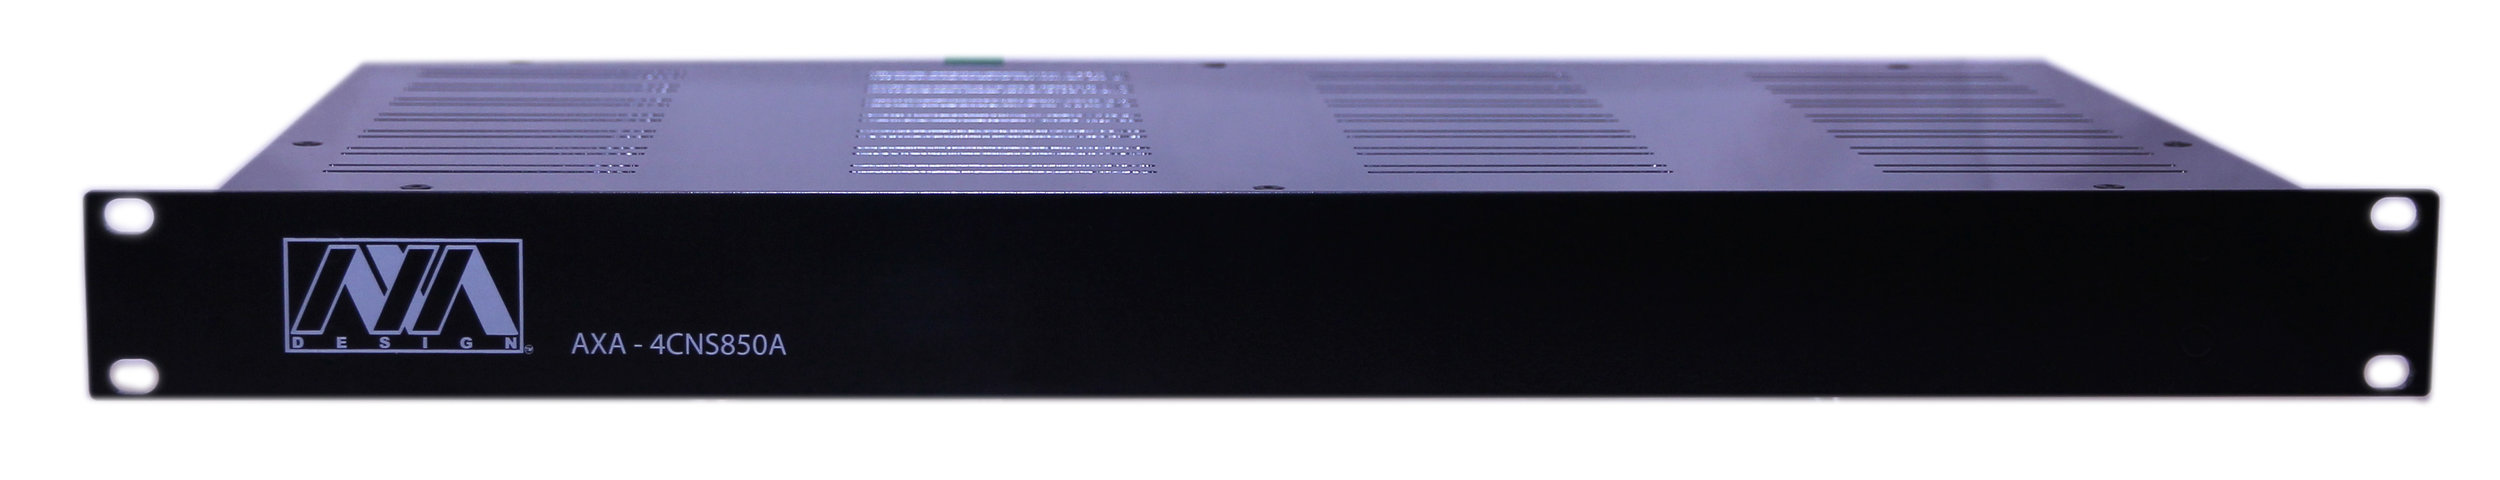 Simple elegant, rack mountable design